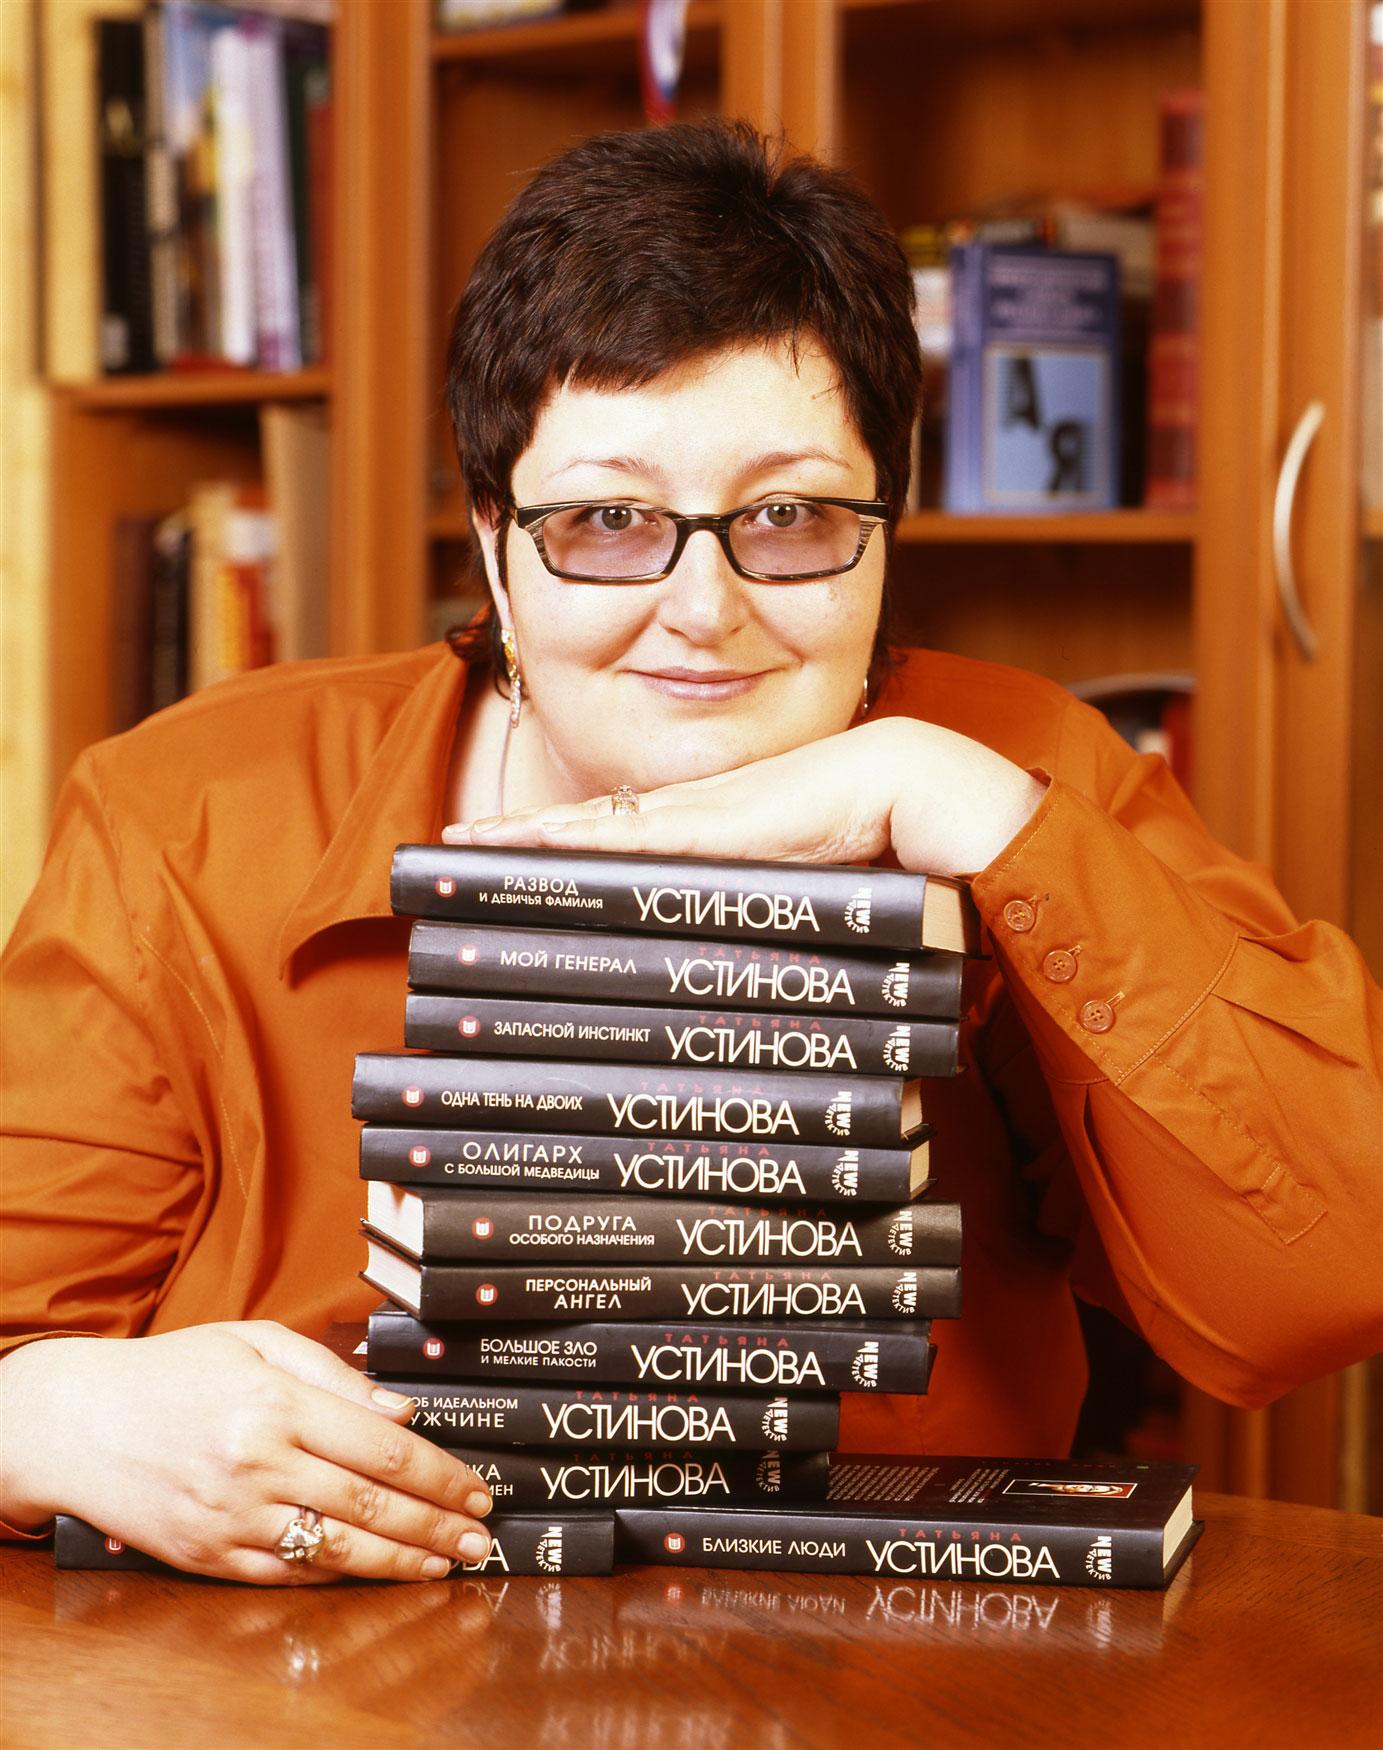 Ustinova Tatyana: biography, books, films